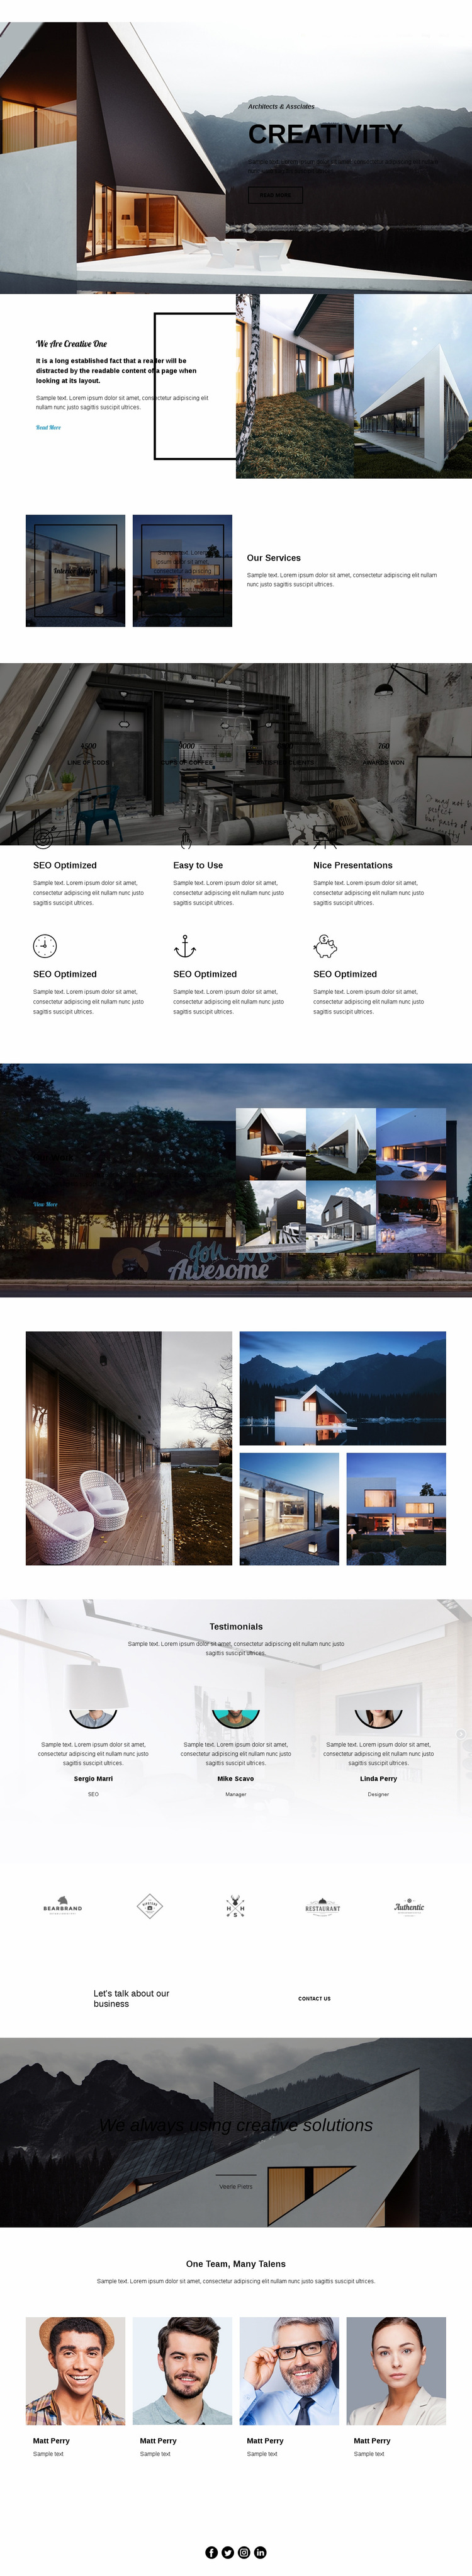 Creativity in architecture Website Mockup